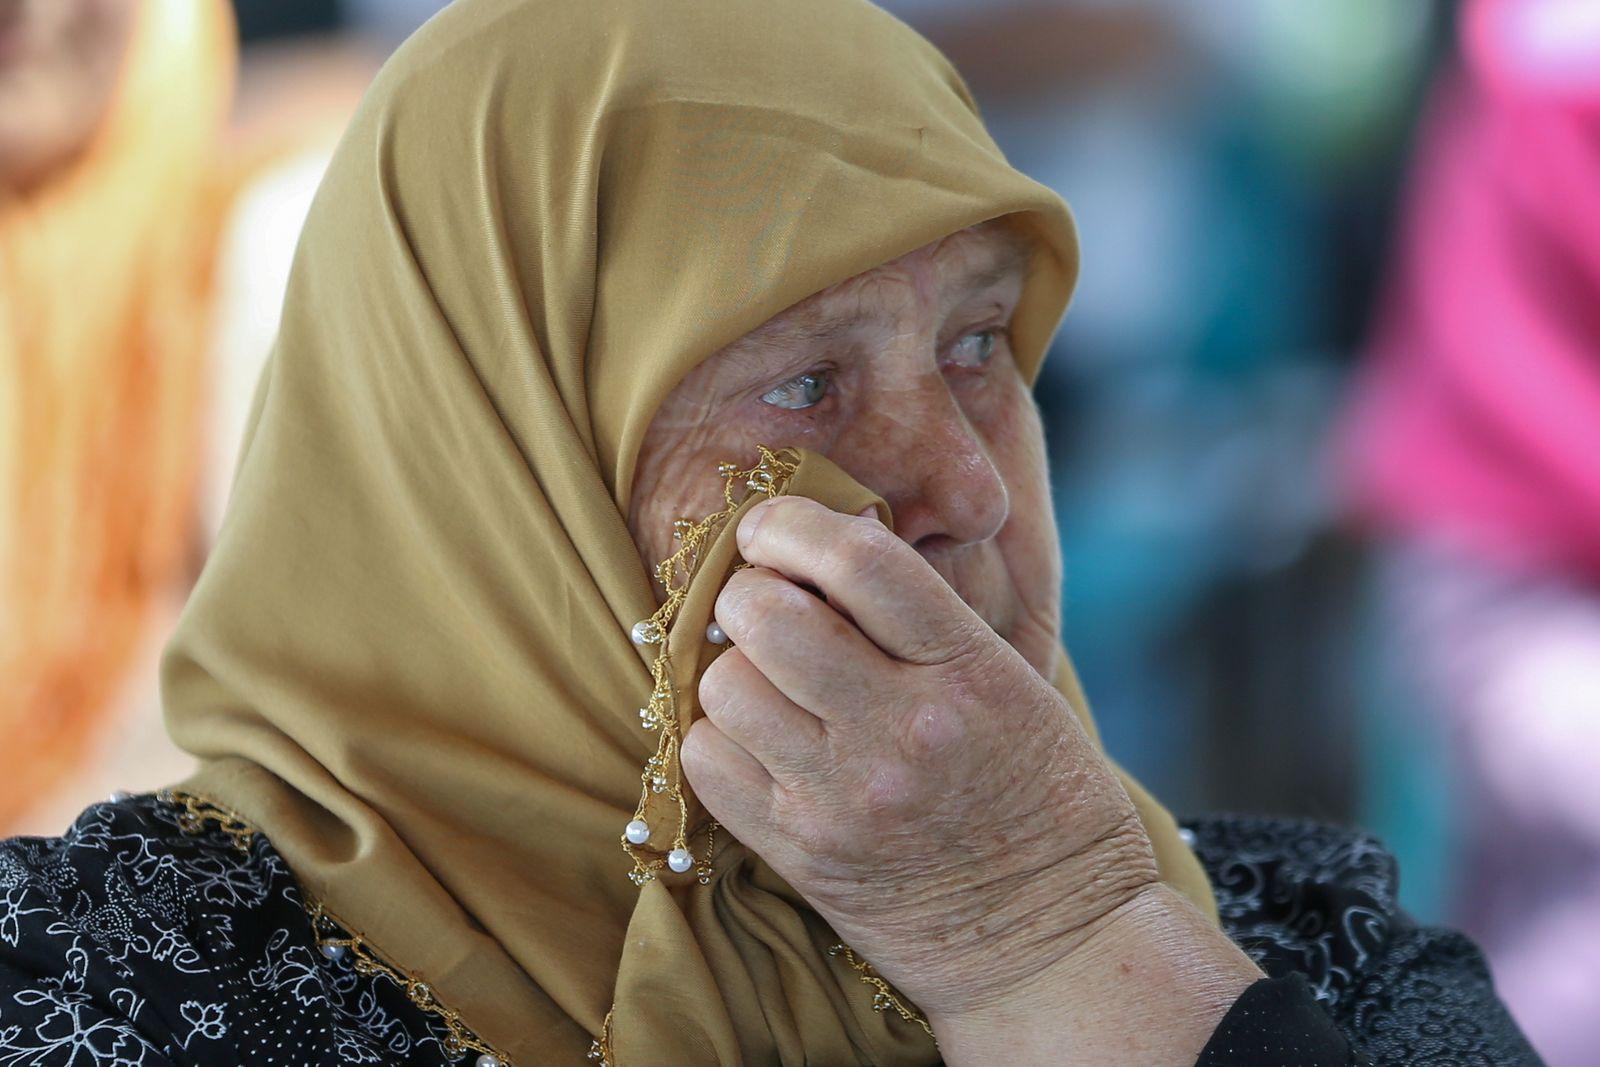 Srebrenica survivors watch the final verdict of Ratko Mladic in Potocari